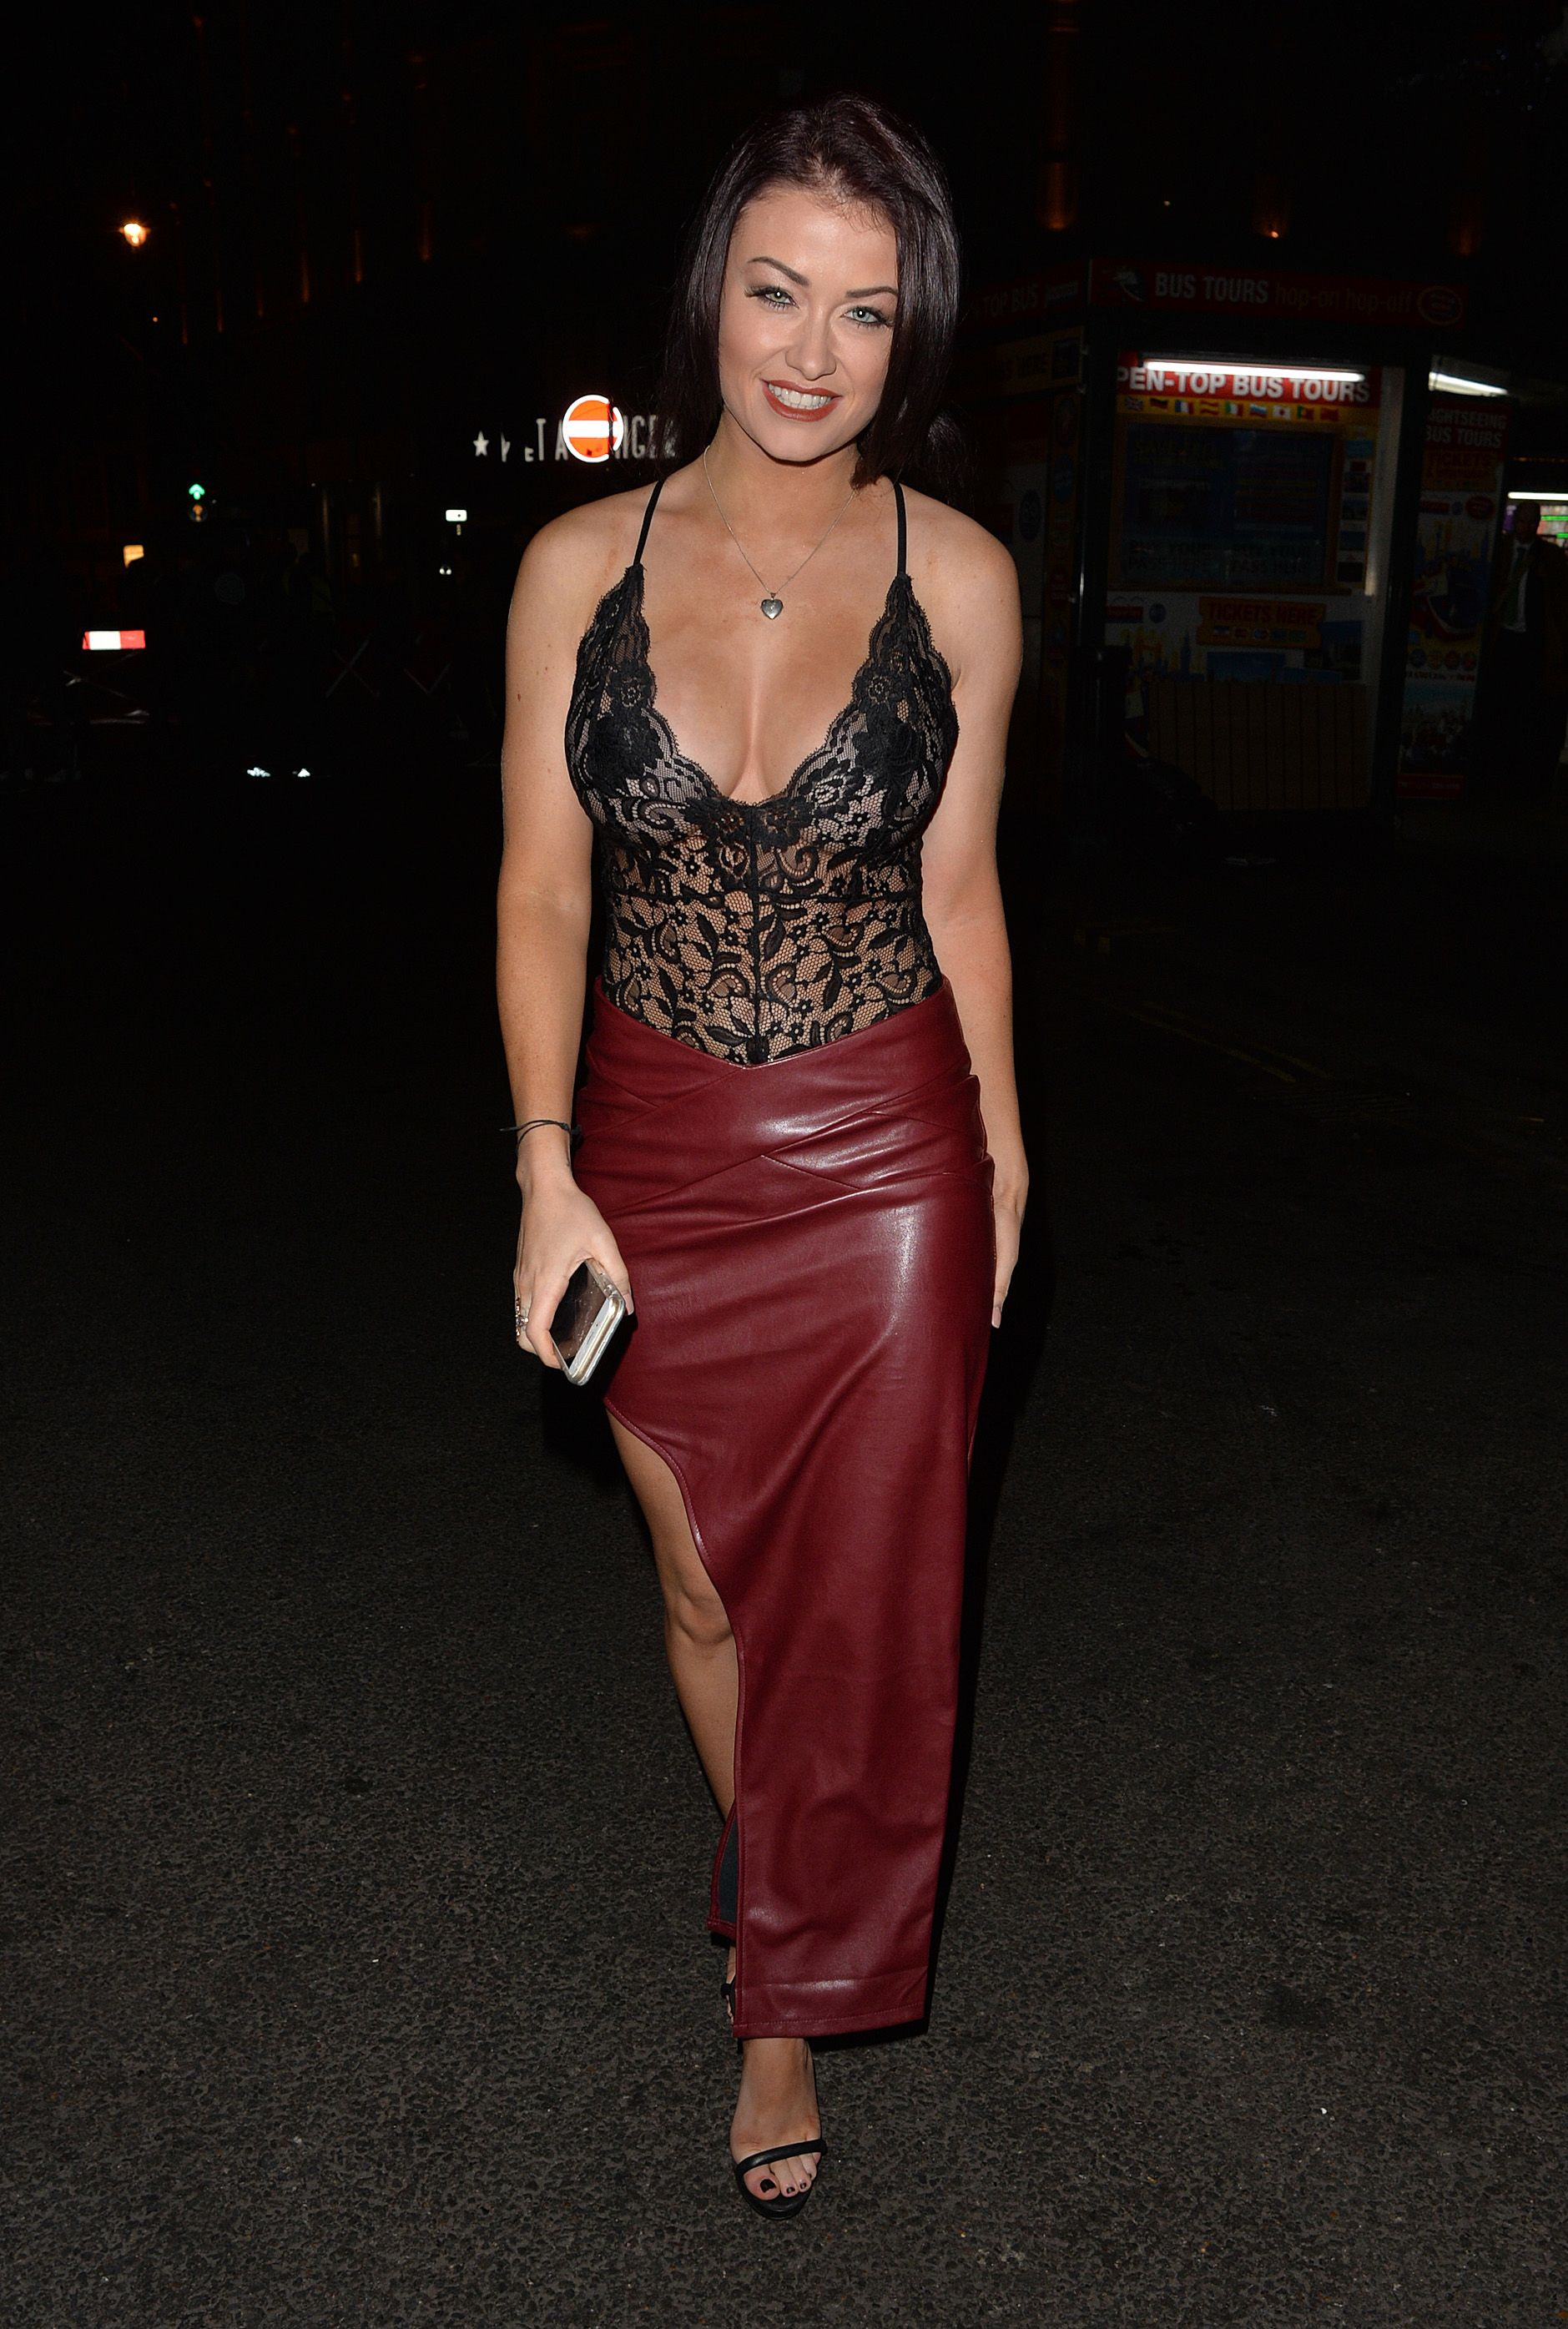 Rita hayek having sexxx